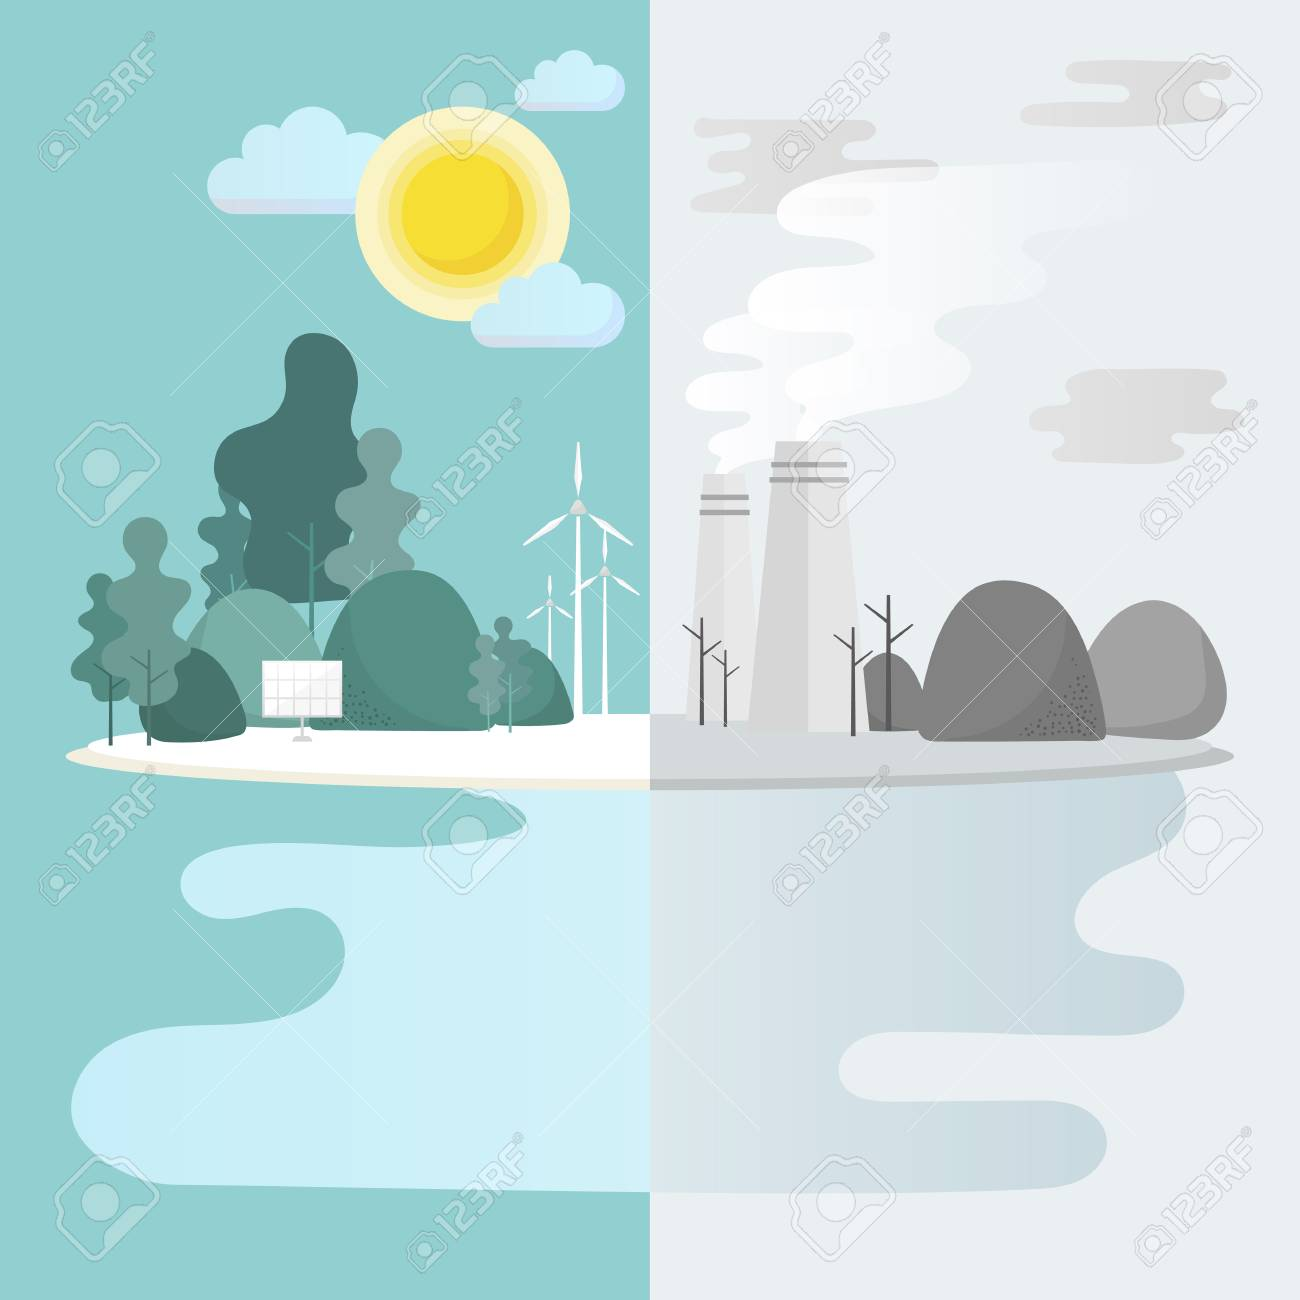 Green city environmental conservation vector - 125970902